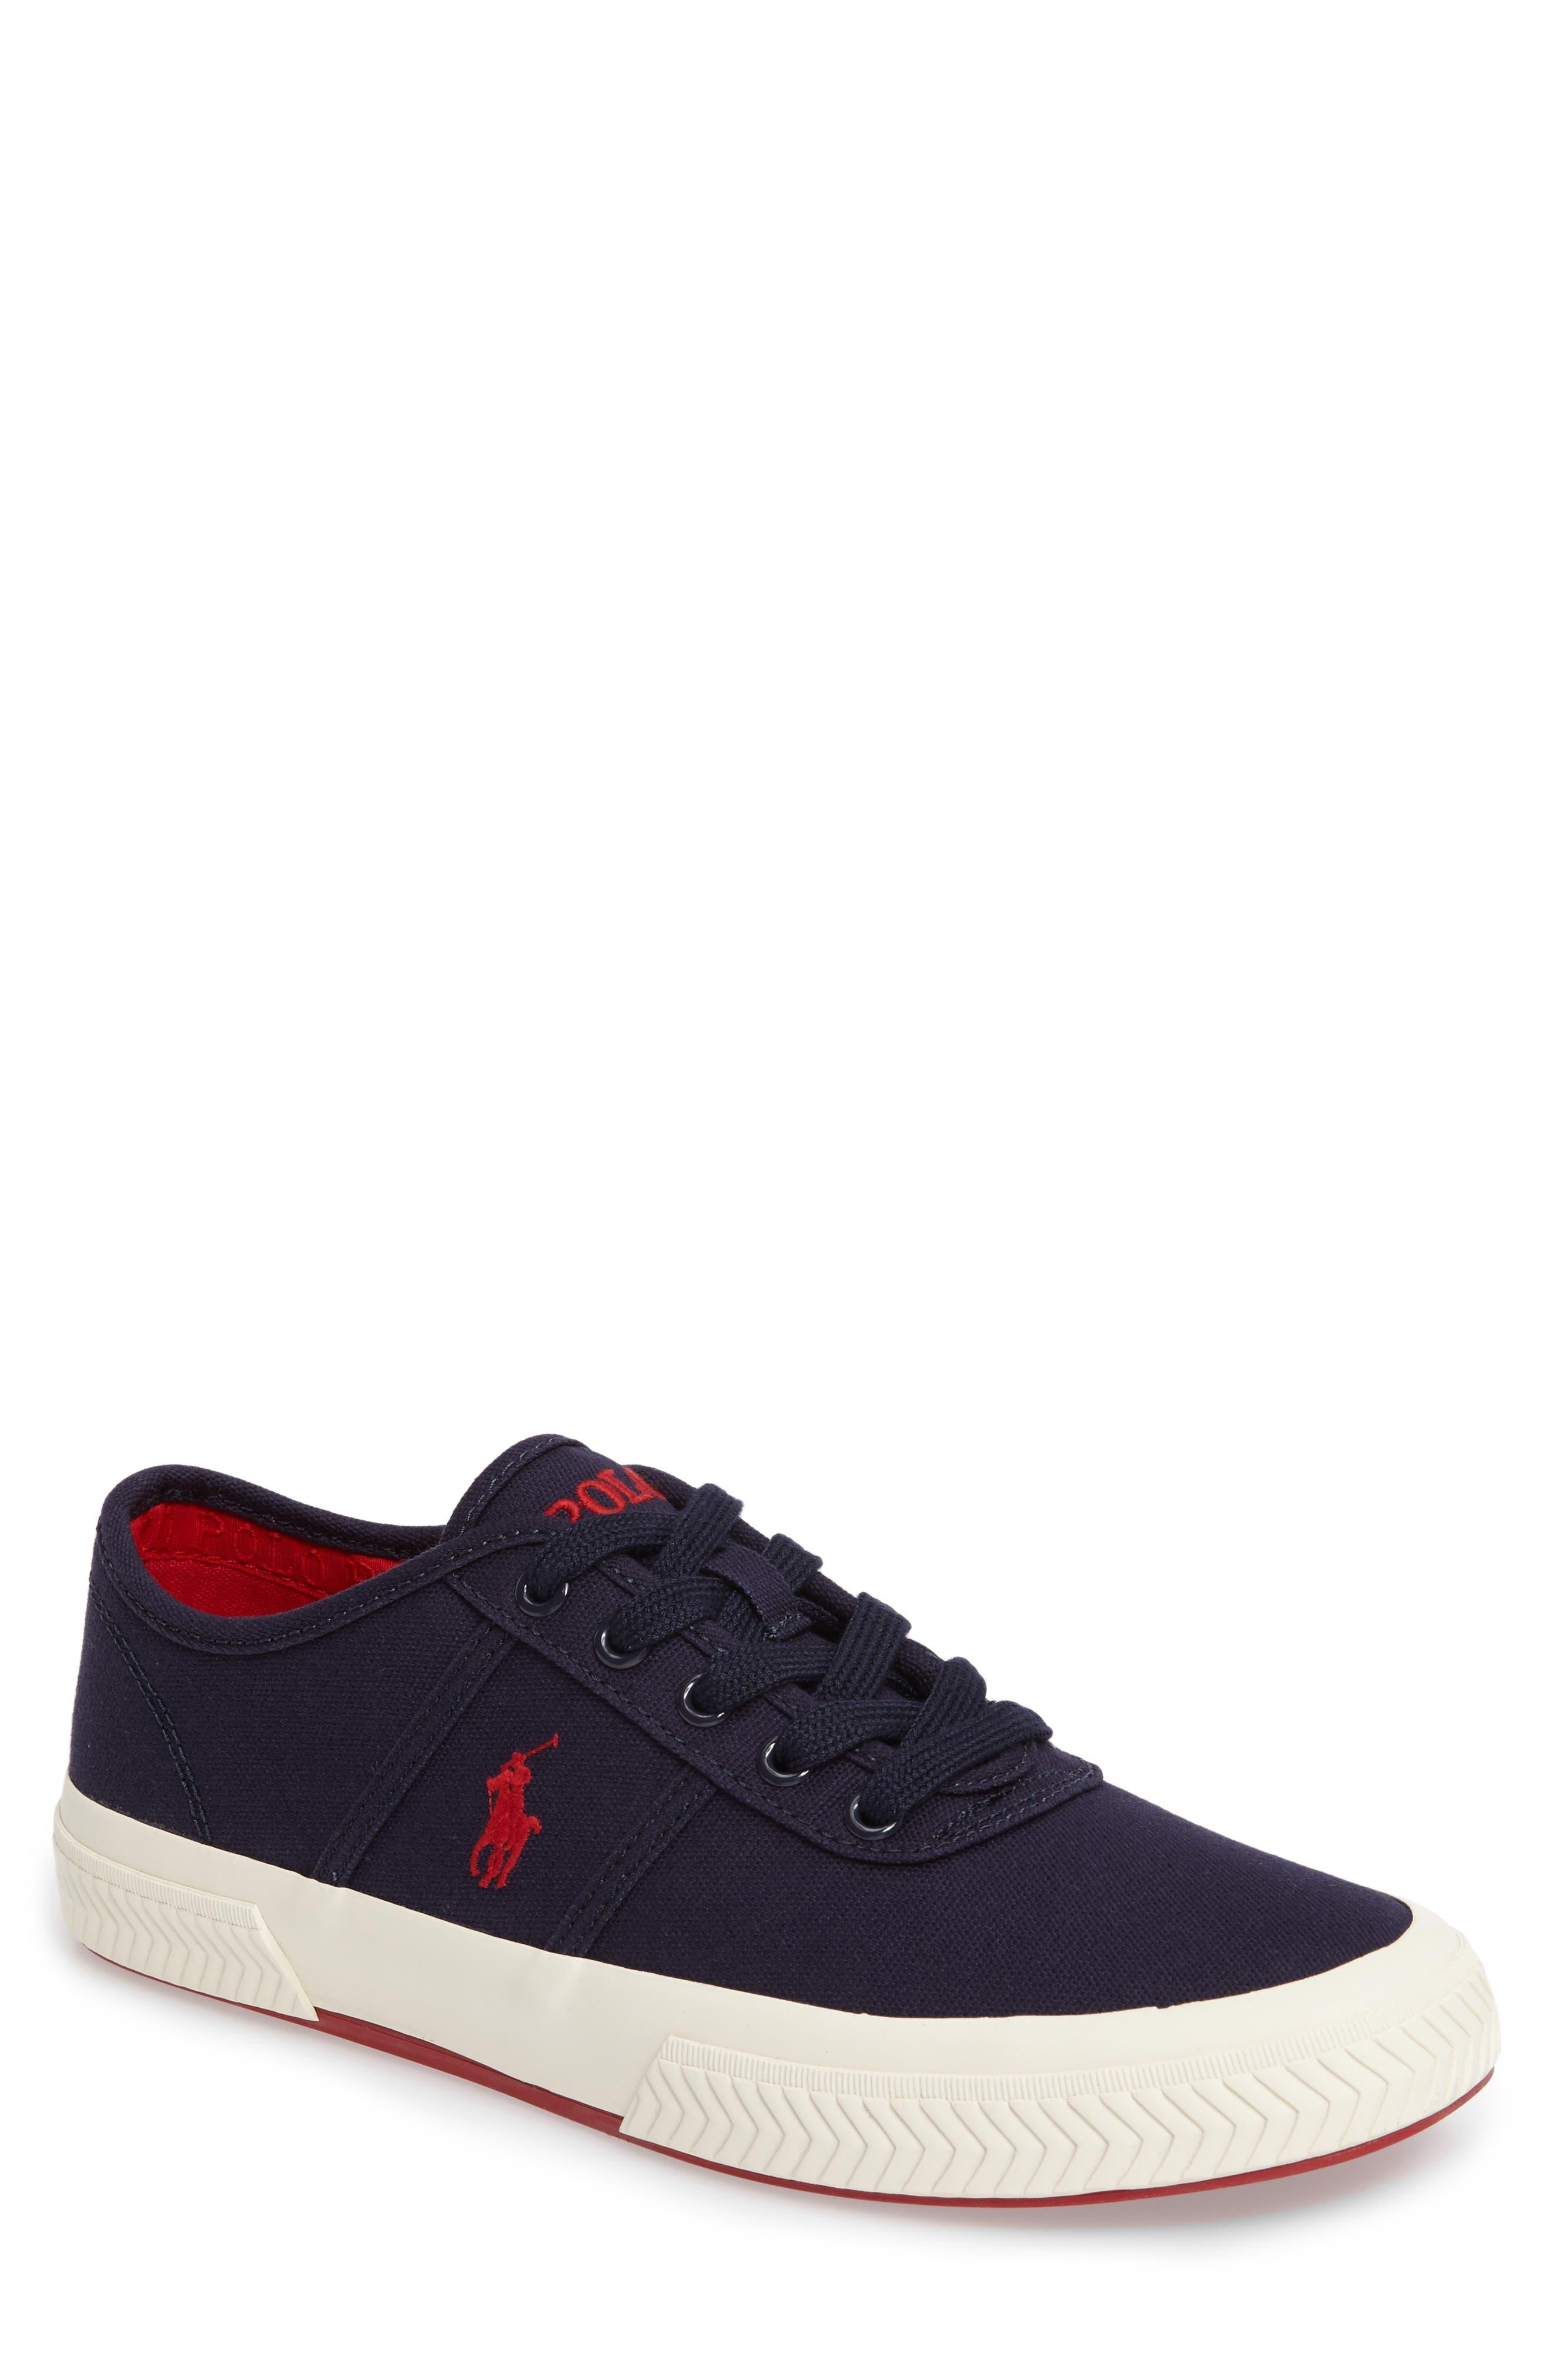 Polo Ralph Lauren Tyrian Sneaker,                             Main thumbnail 1, color,                             Newport Navy